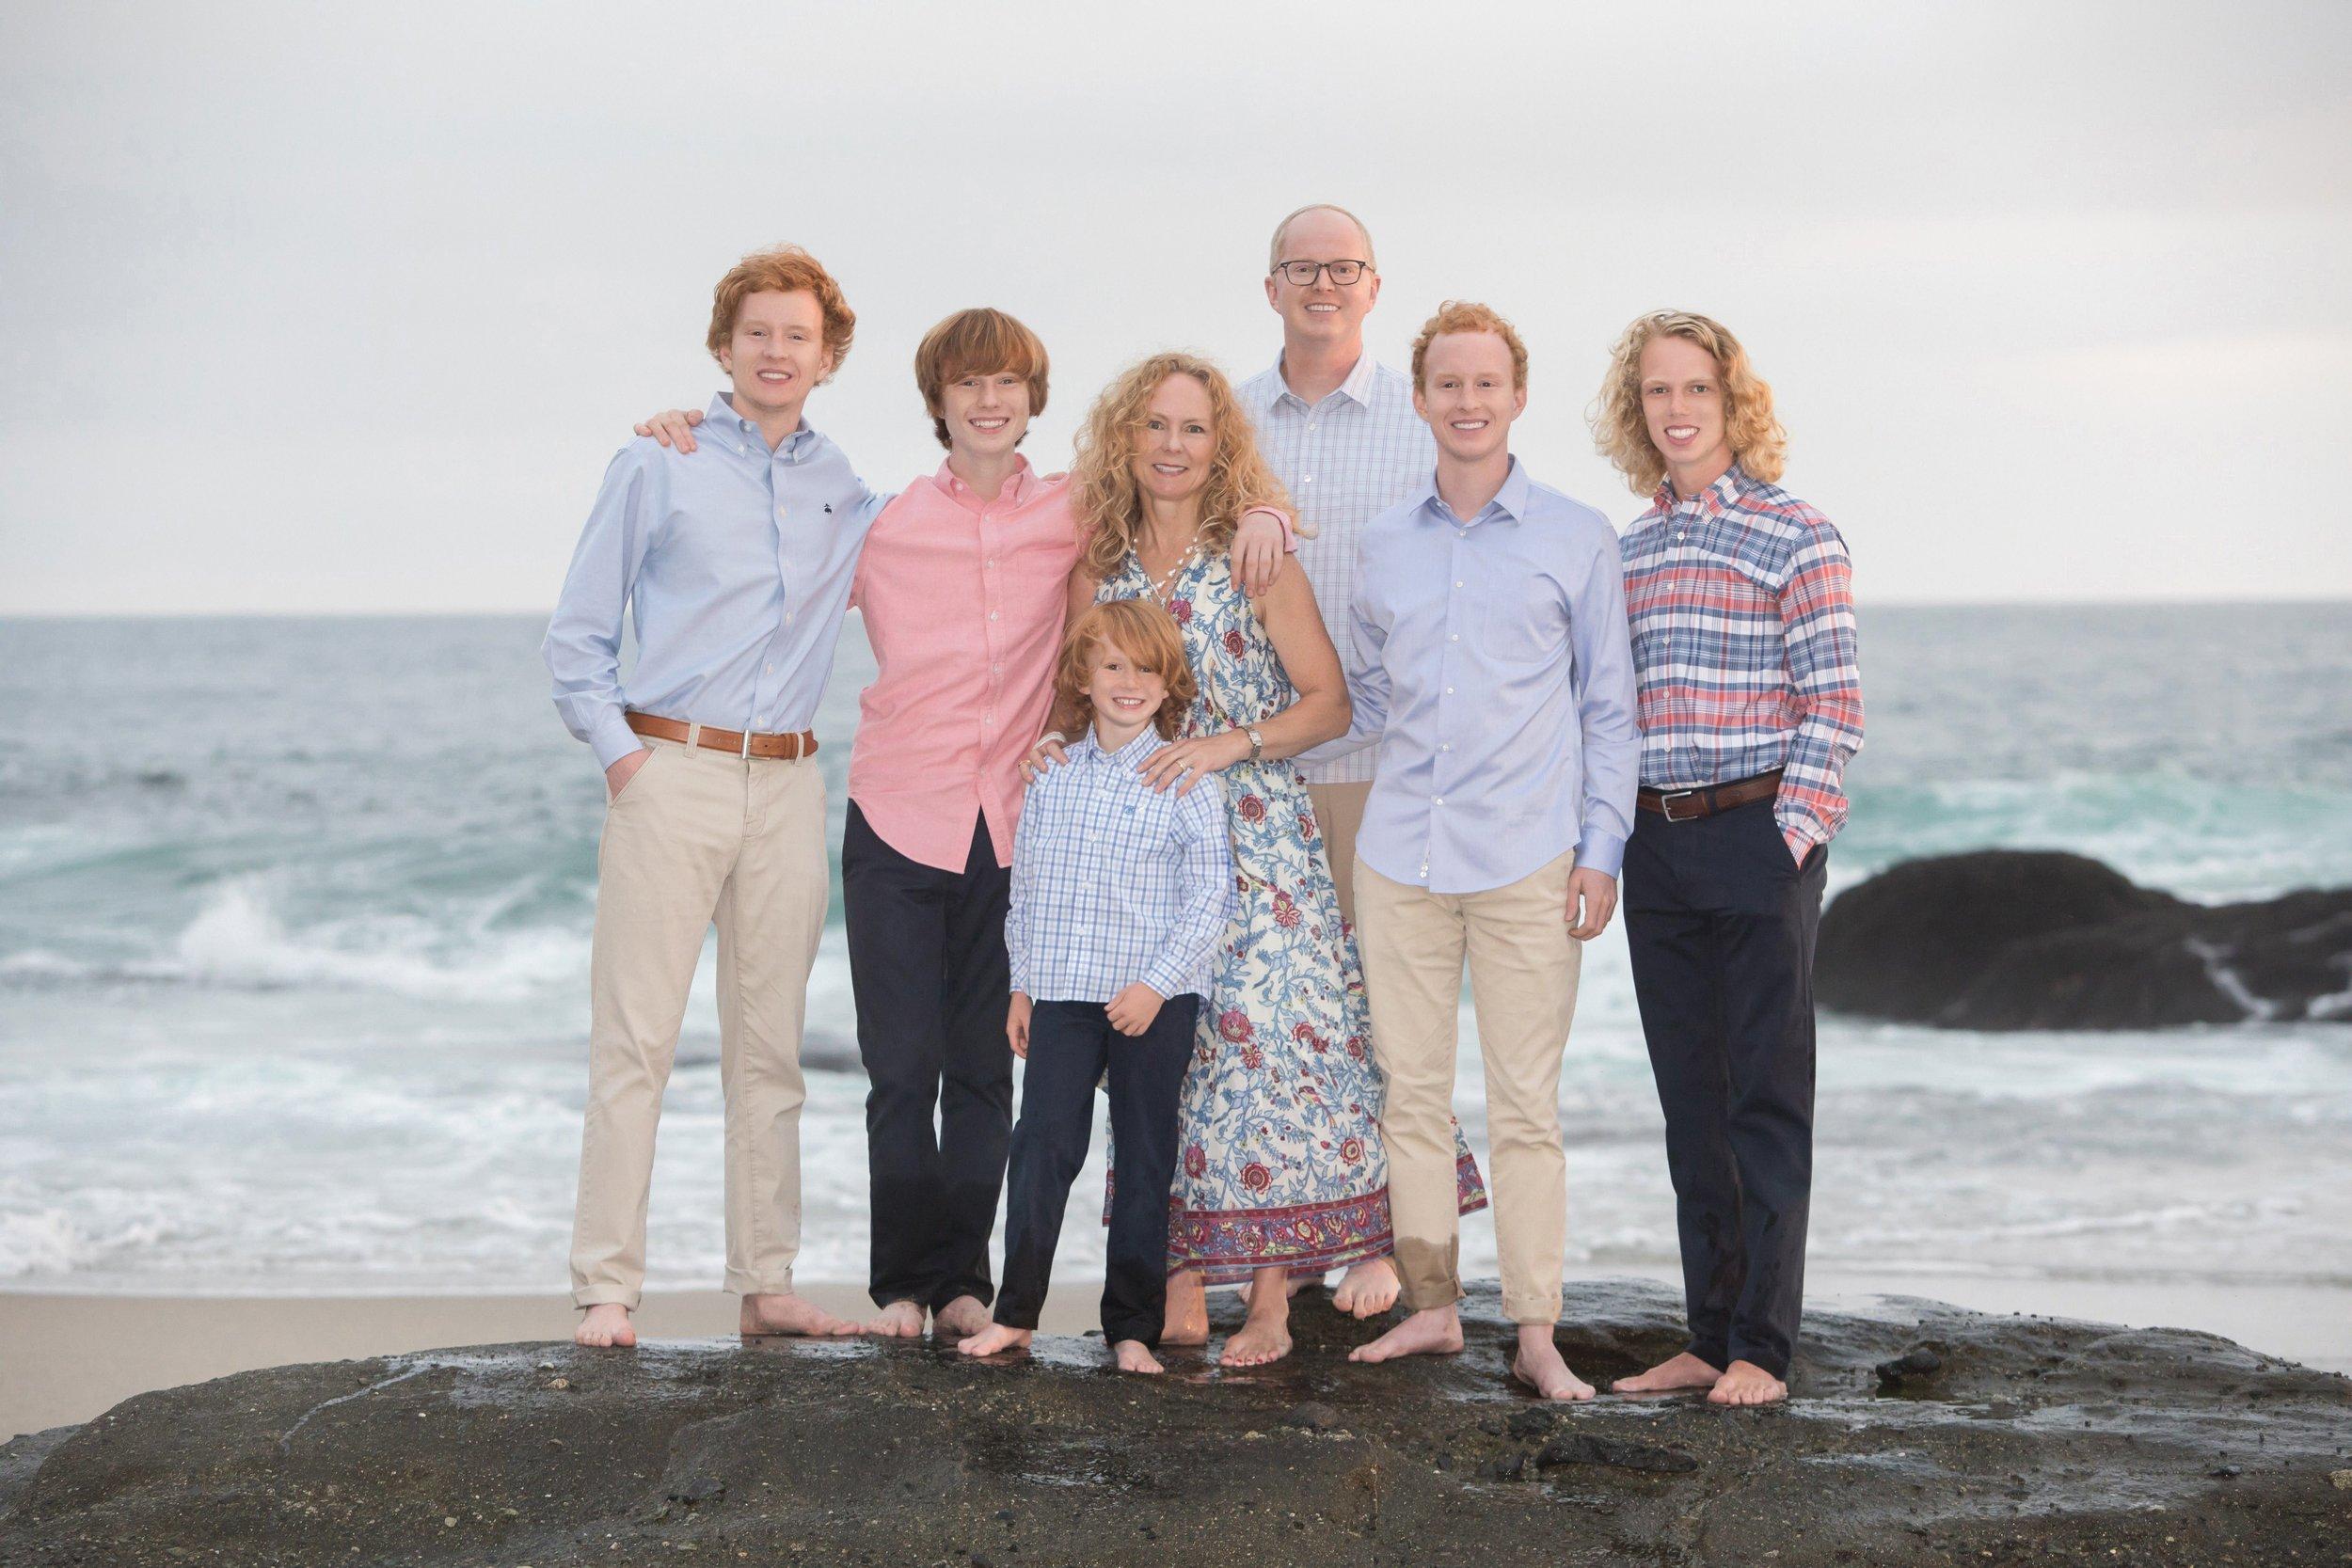 Family Portraits at the beach - Laguna Beach, CA